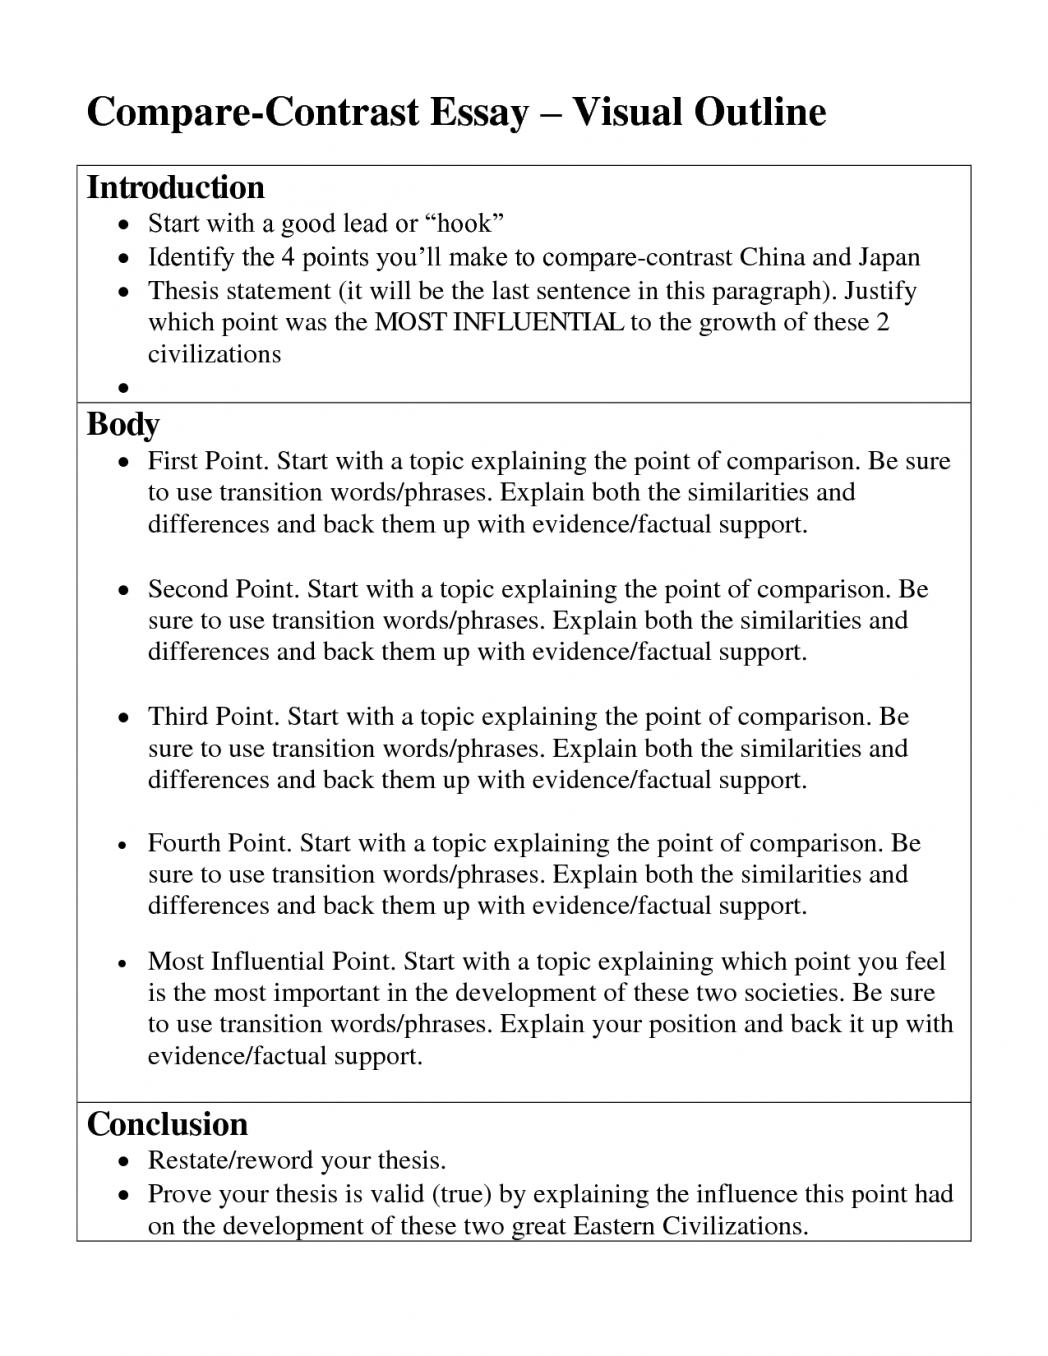 008 Make Money Writing Essays How To Write Essay Outline Template Student For 1048x1356 Best University High School Reddit Full